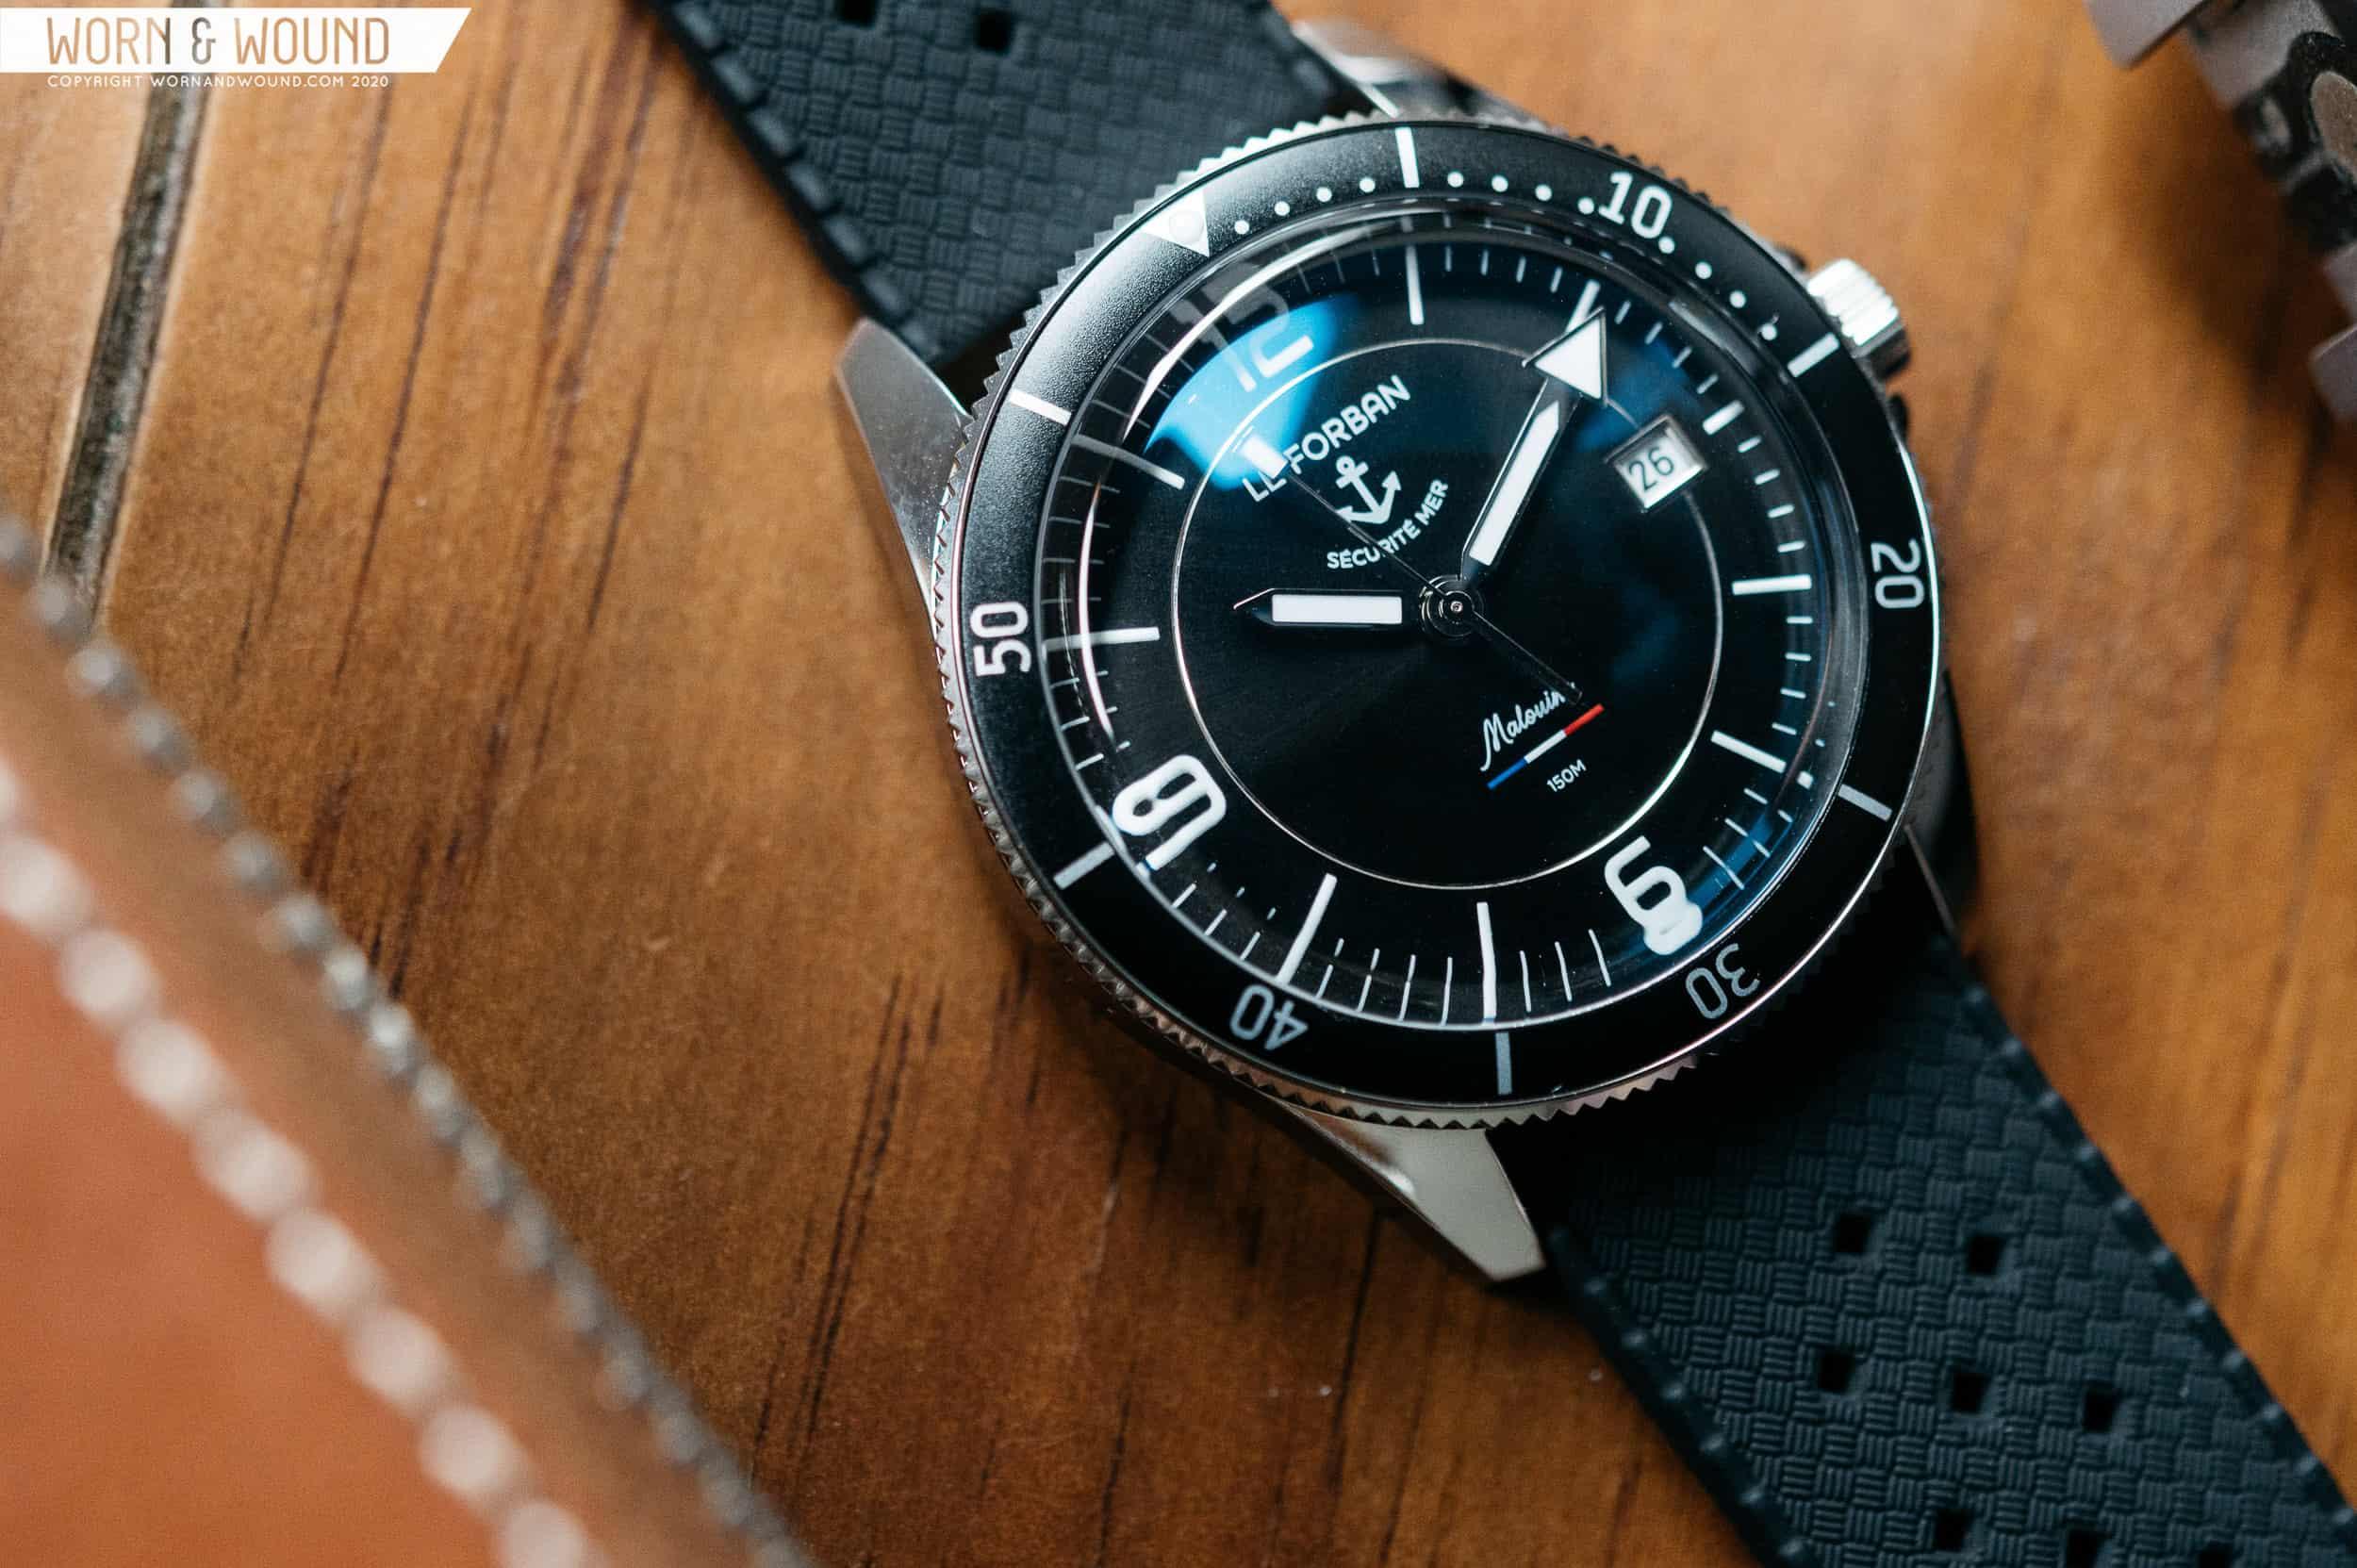 Le-Forban-Malouine-Dive-Watch-Review-4.j